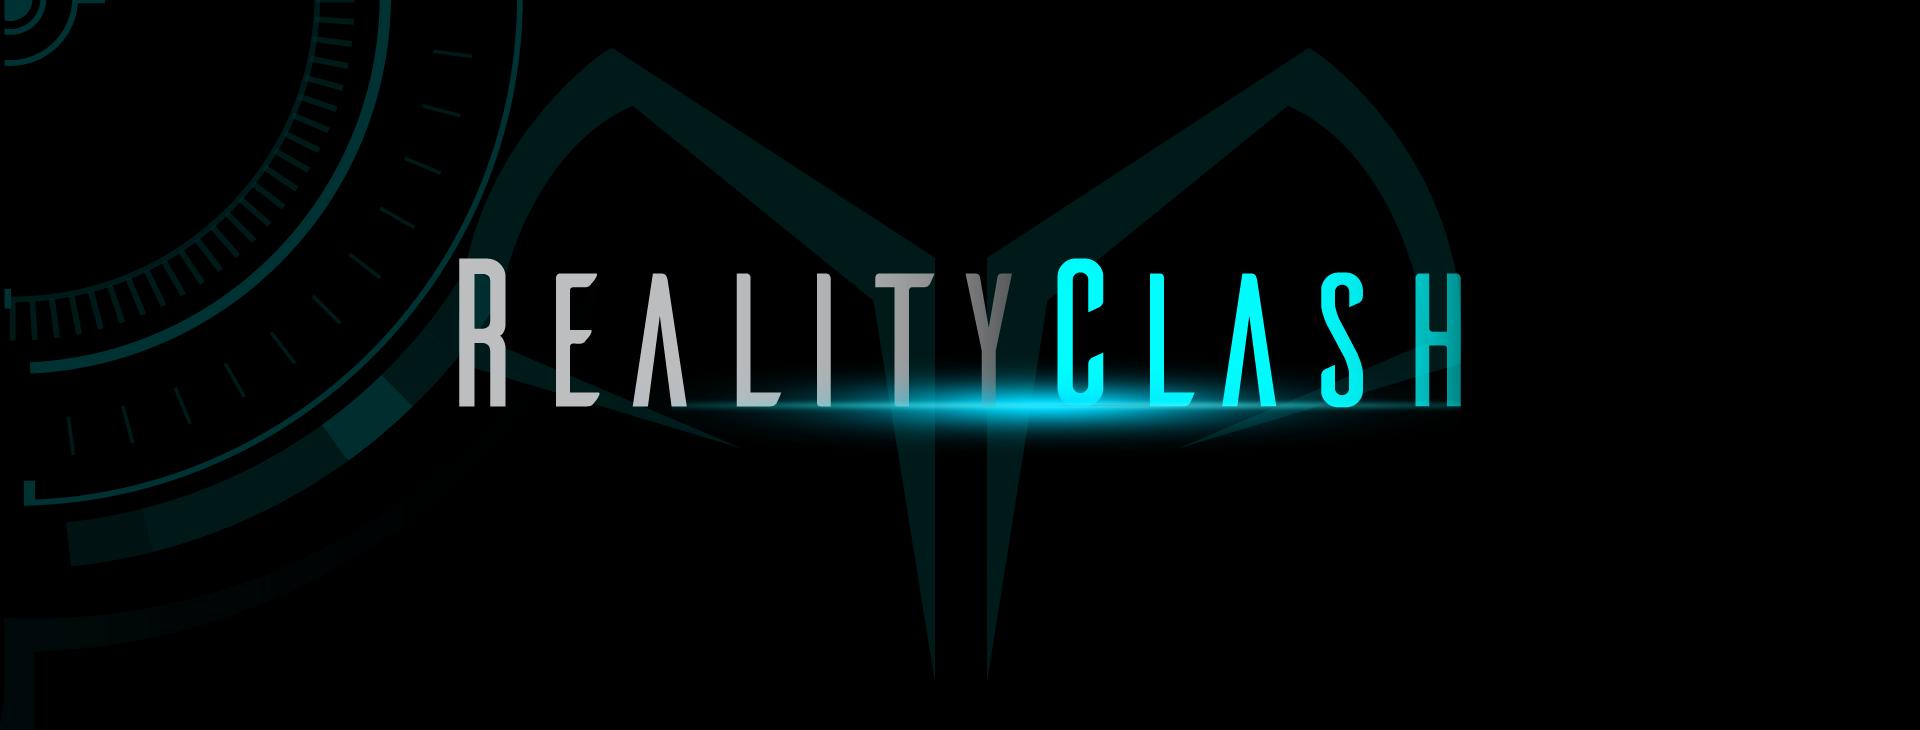 RealityClash PRHeaderImage